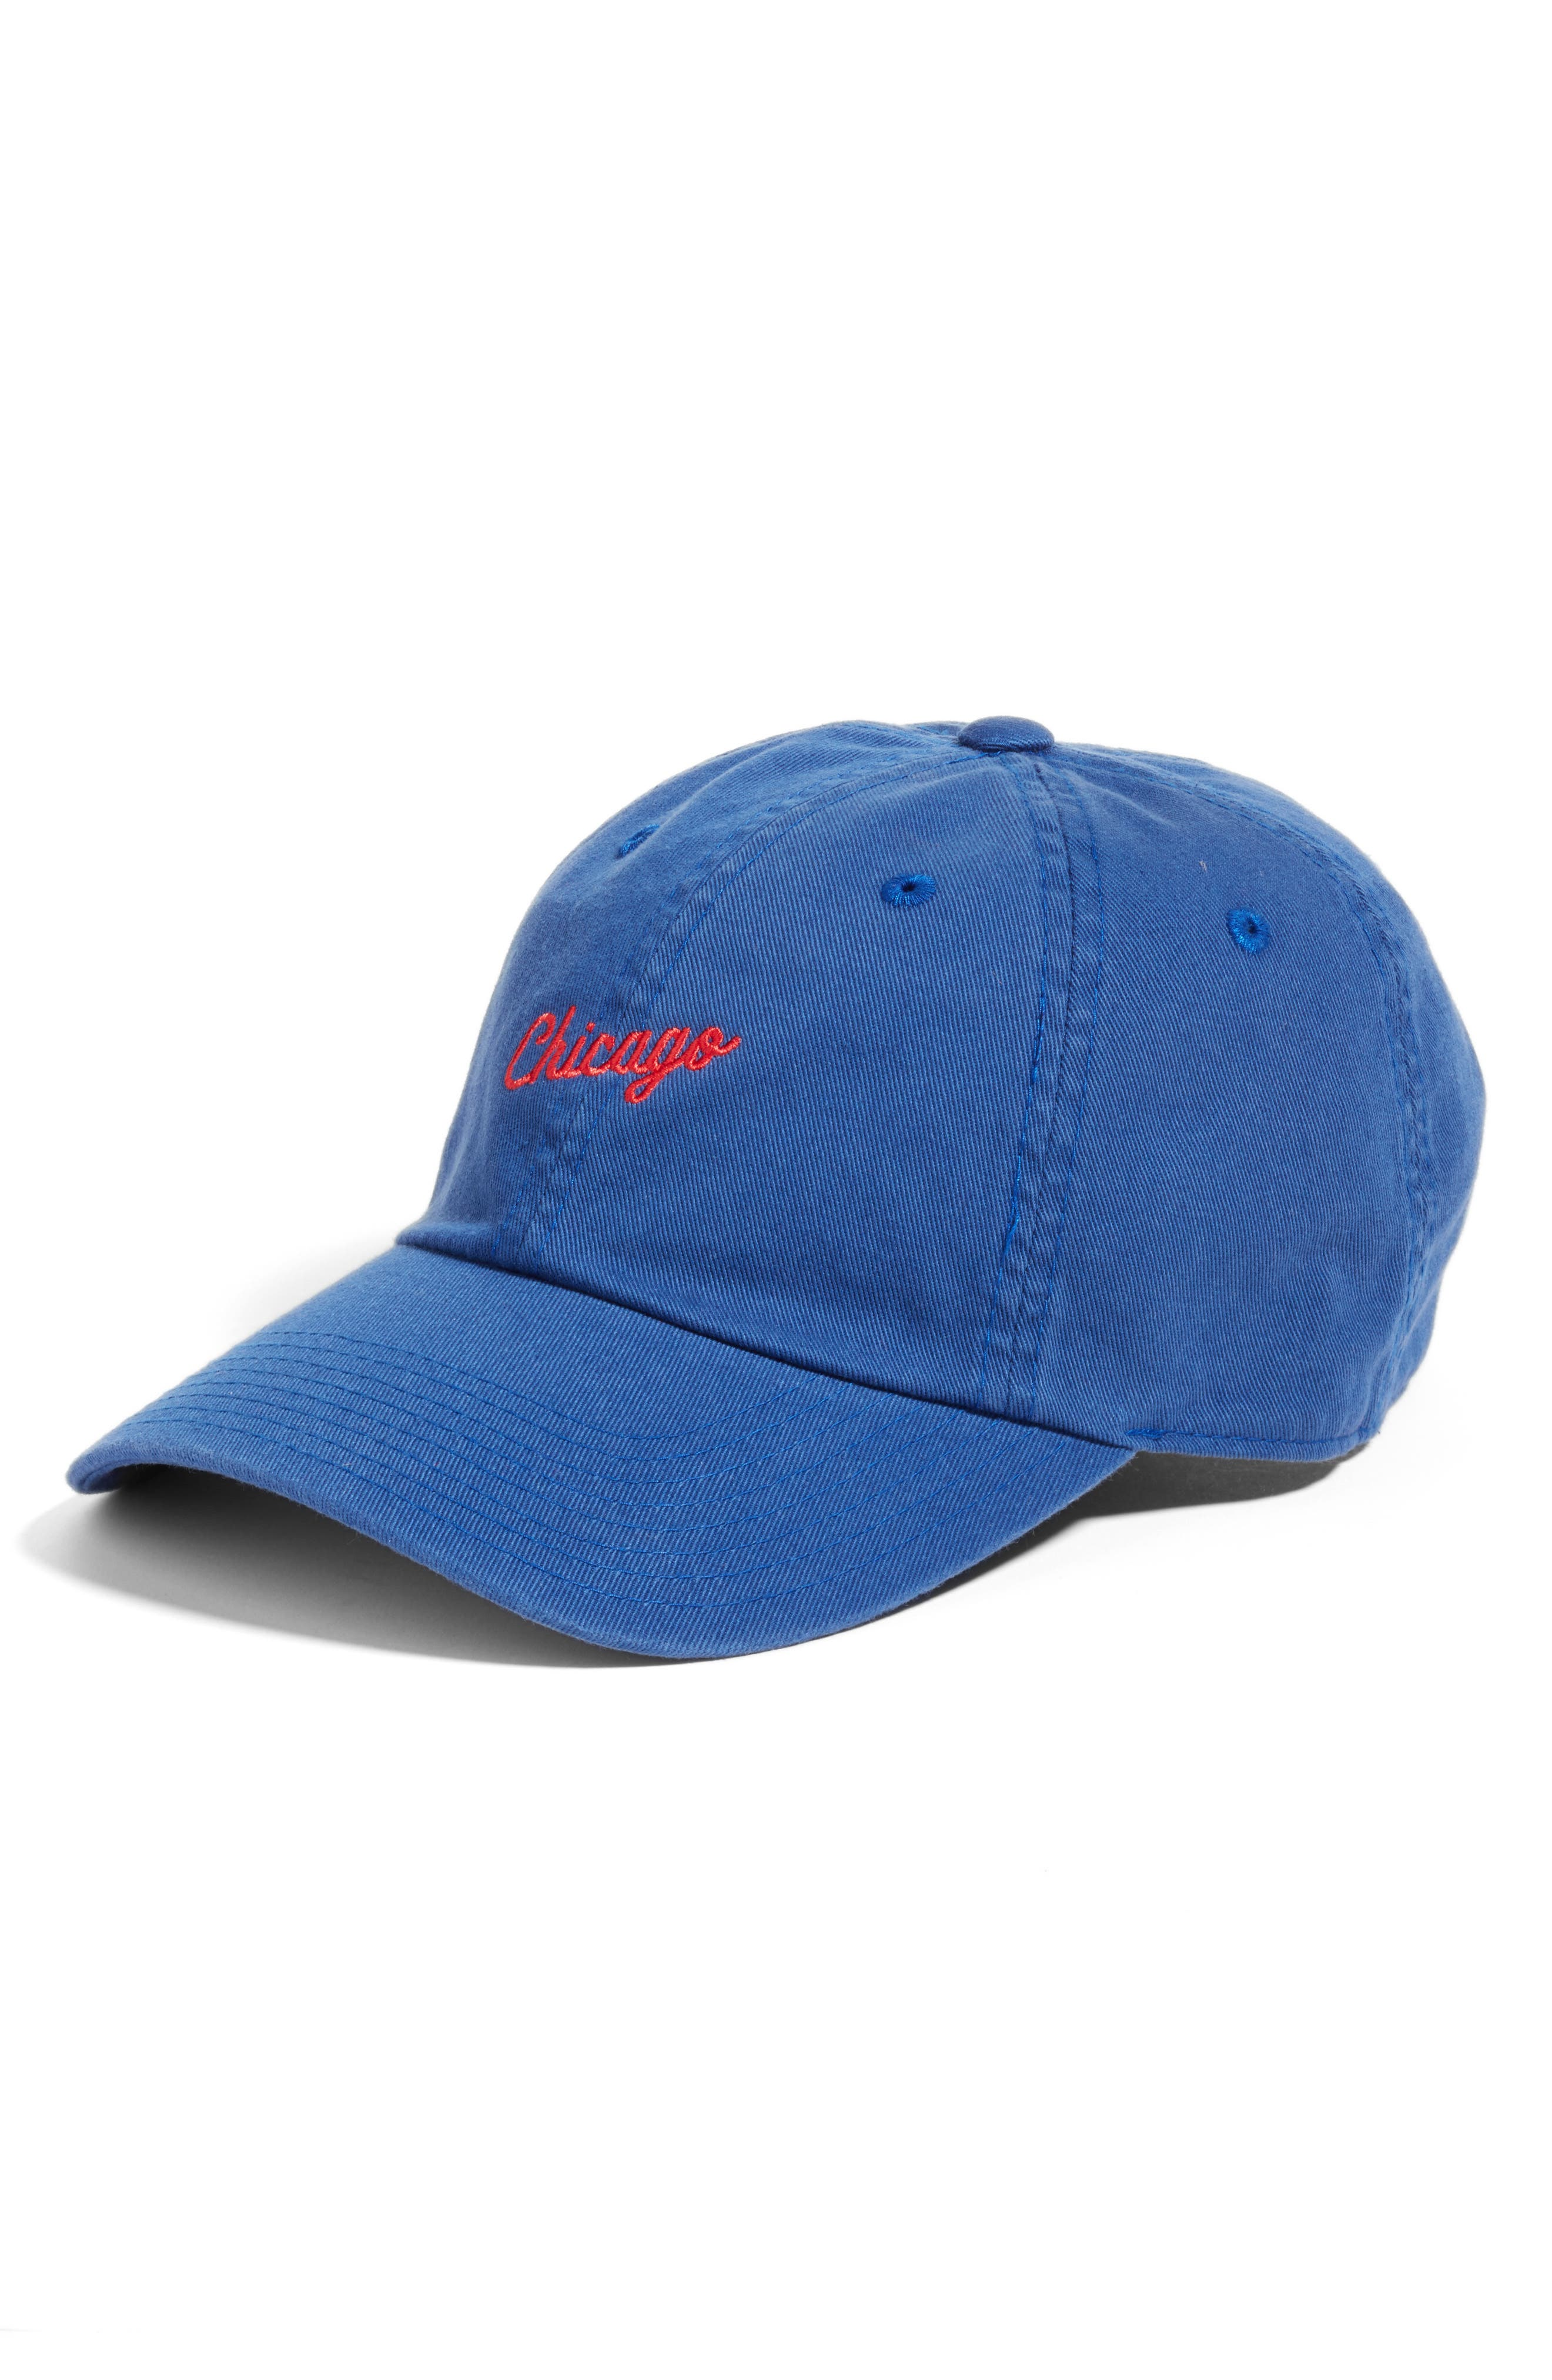 Boardshort - Chicago Baseball Cap,                             Main thumbnail 1, color,                             400